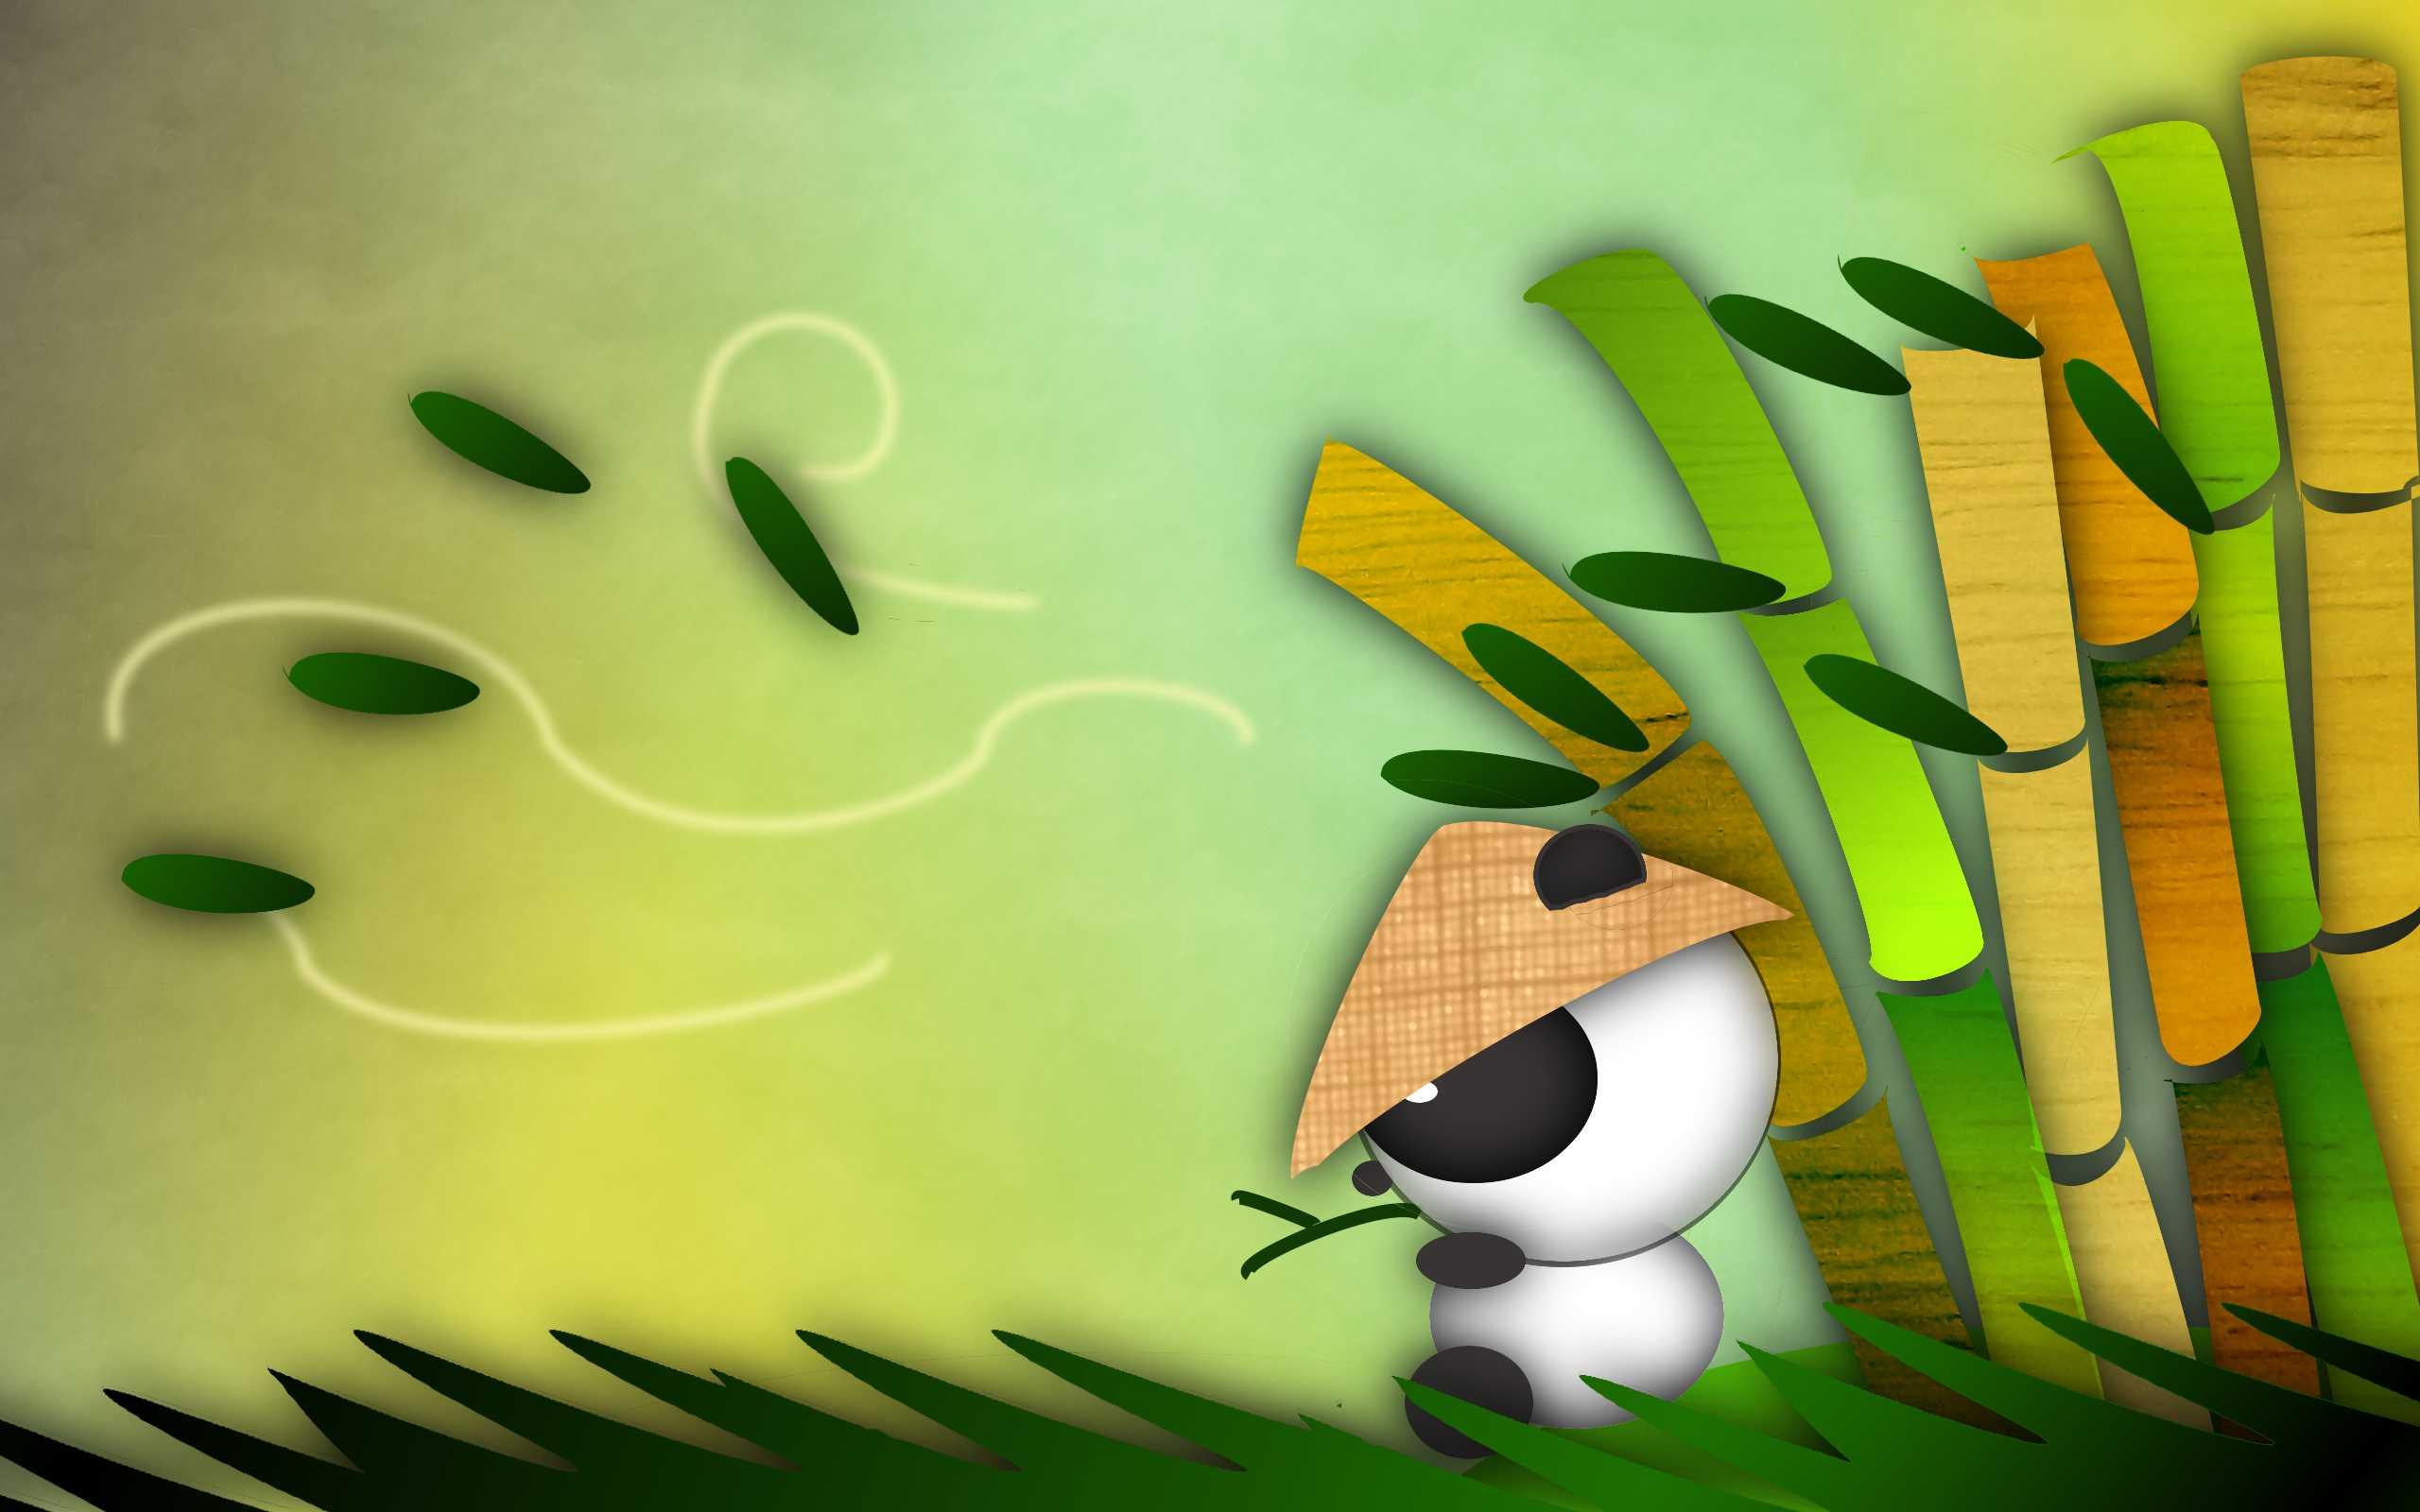 Cute Cartoon Fishing Wallpaper Animated Kids 3281 Wallpaper 2560x1600